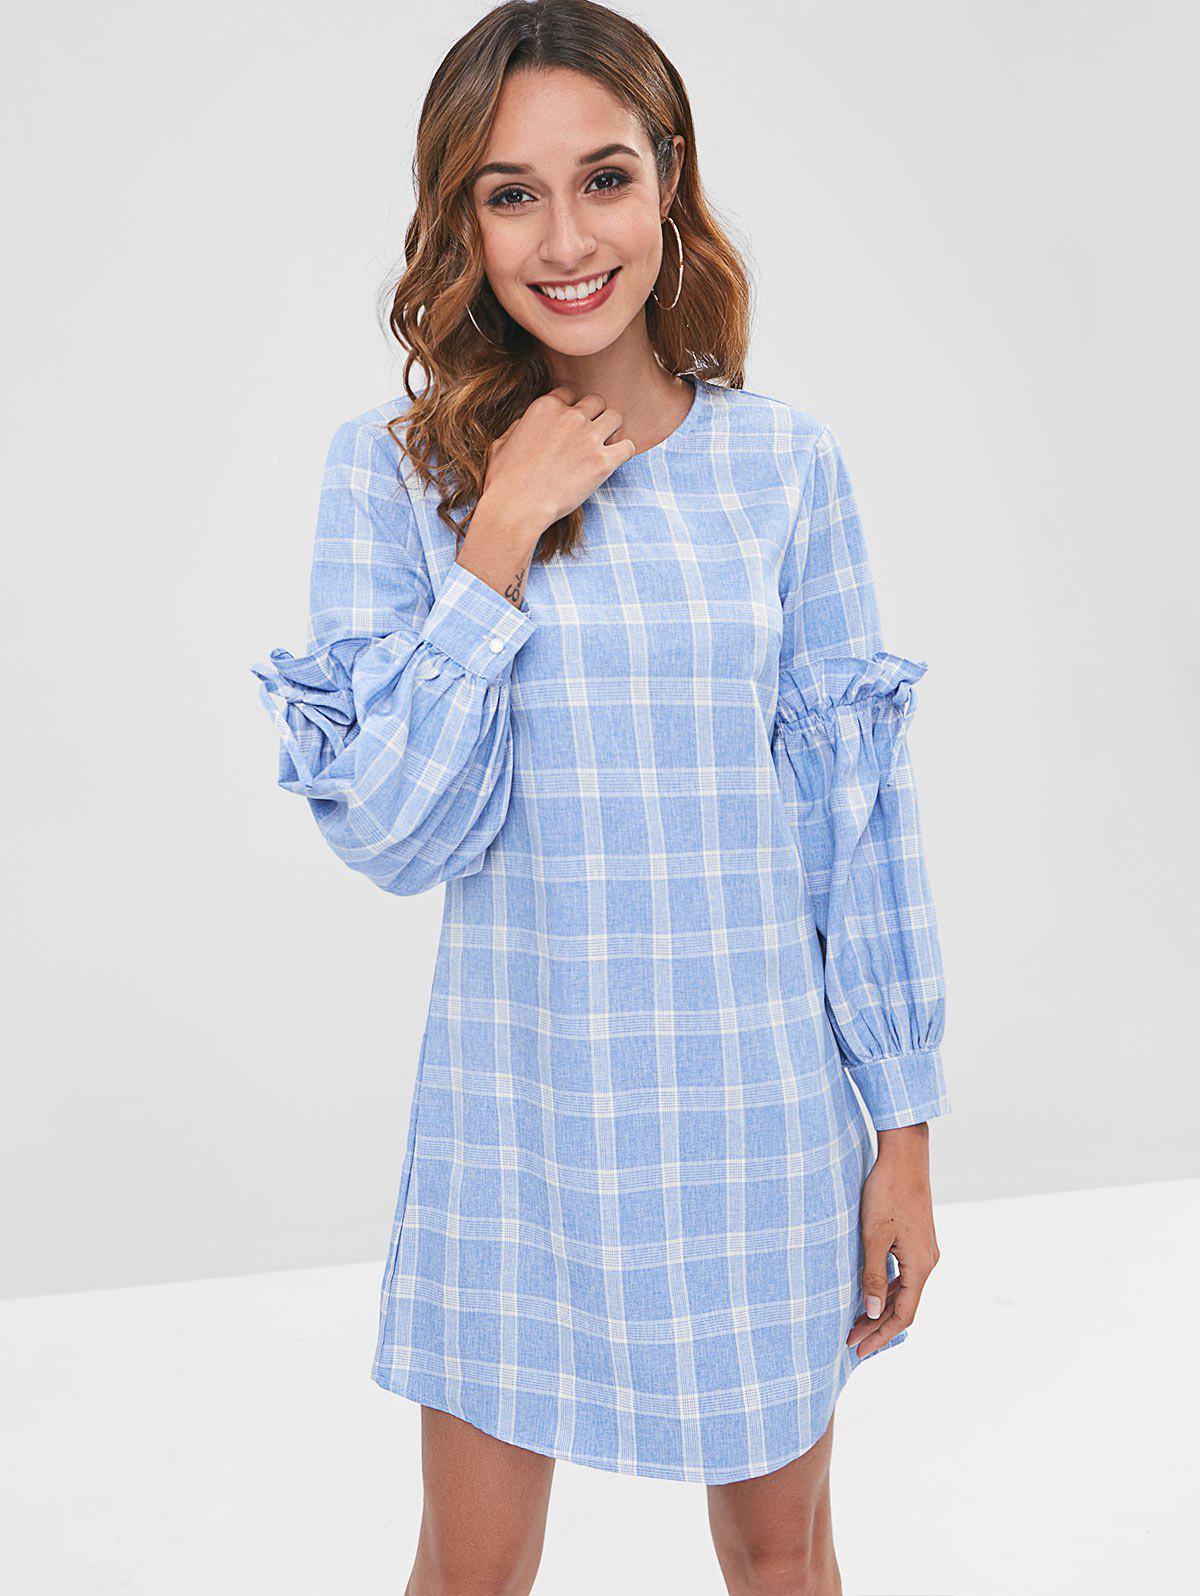 ZAFUL Plaid Lantern Sleeve Mini Dress, Light blue